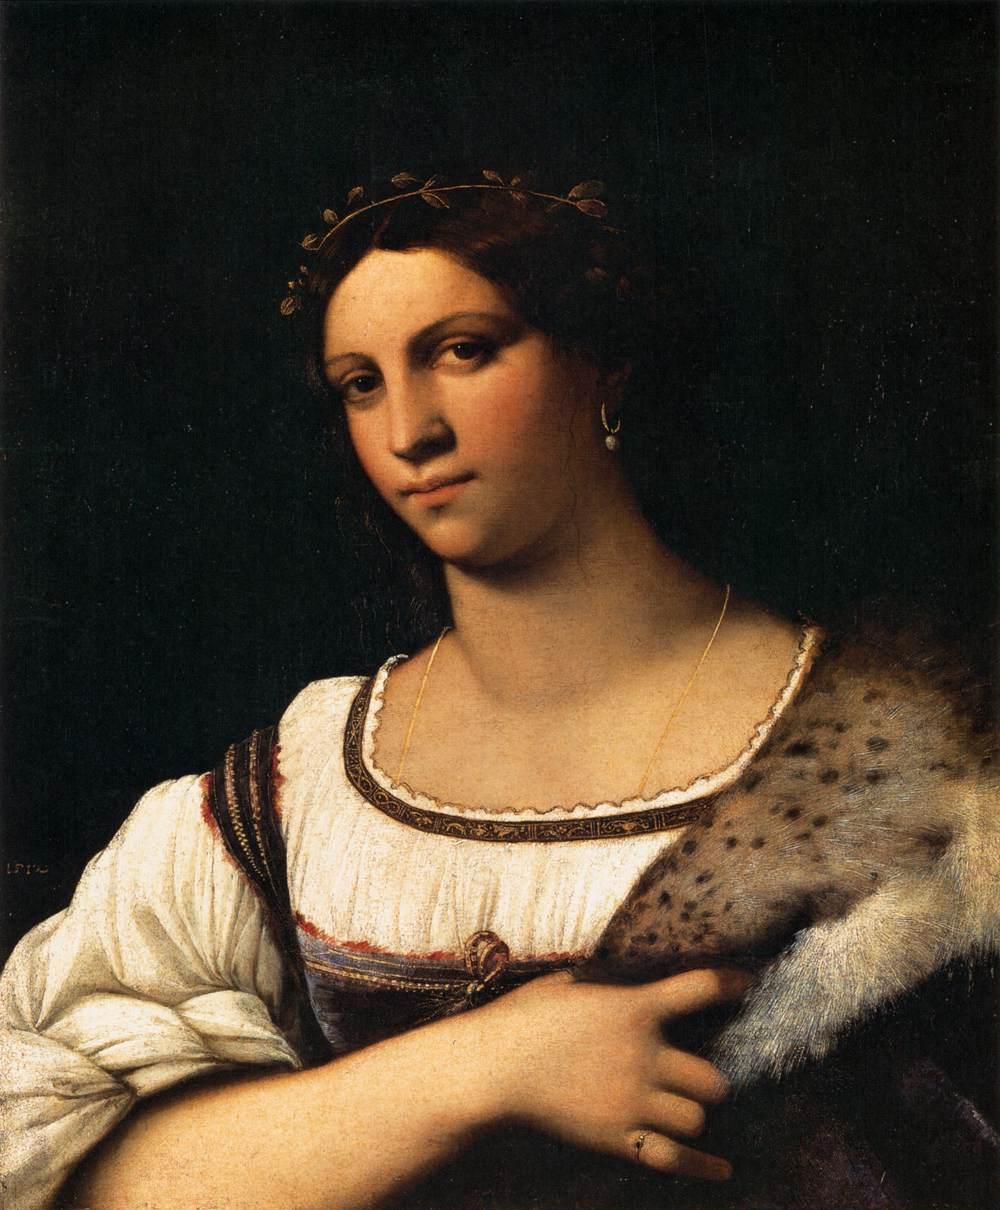 https://upload.wikimedia.org/wikipedia/commons/e/ee/Sebastiano_del_Piombo_-_Portrait_of_a_Woman_-_WGA21119.jpg